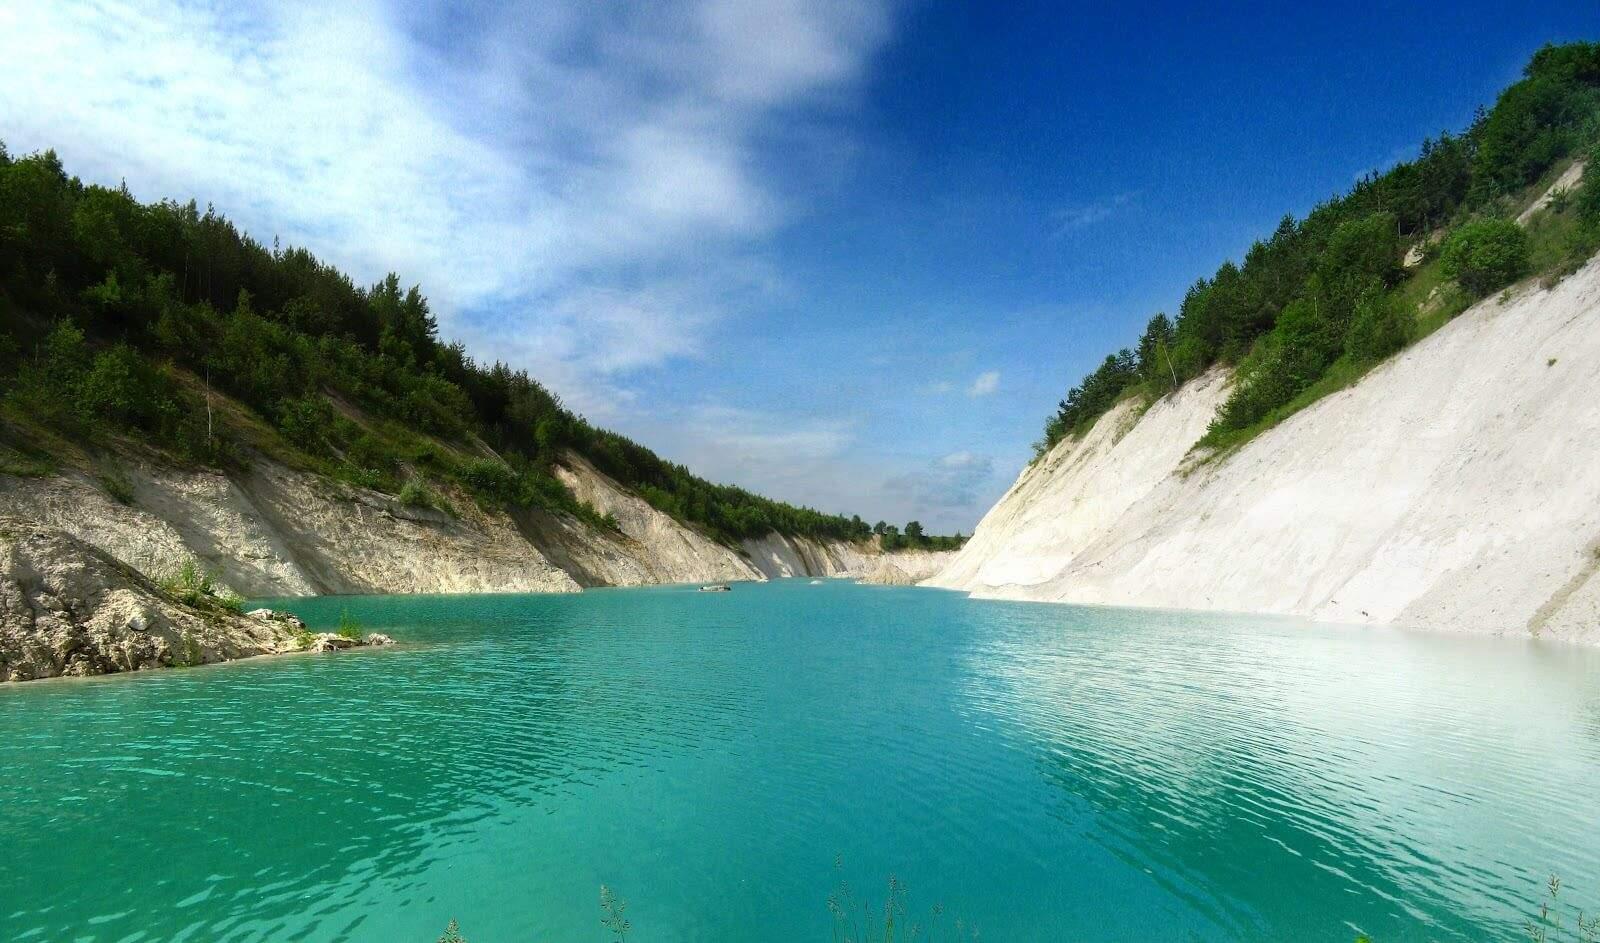 Turquose water of chalkpits in Belarus, Belarus tourist attractions